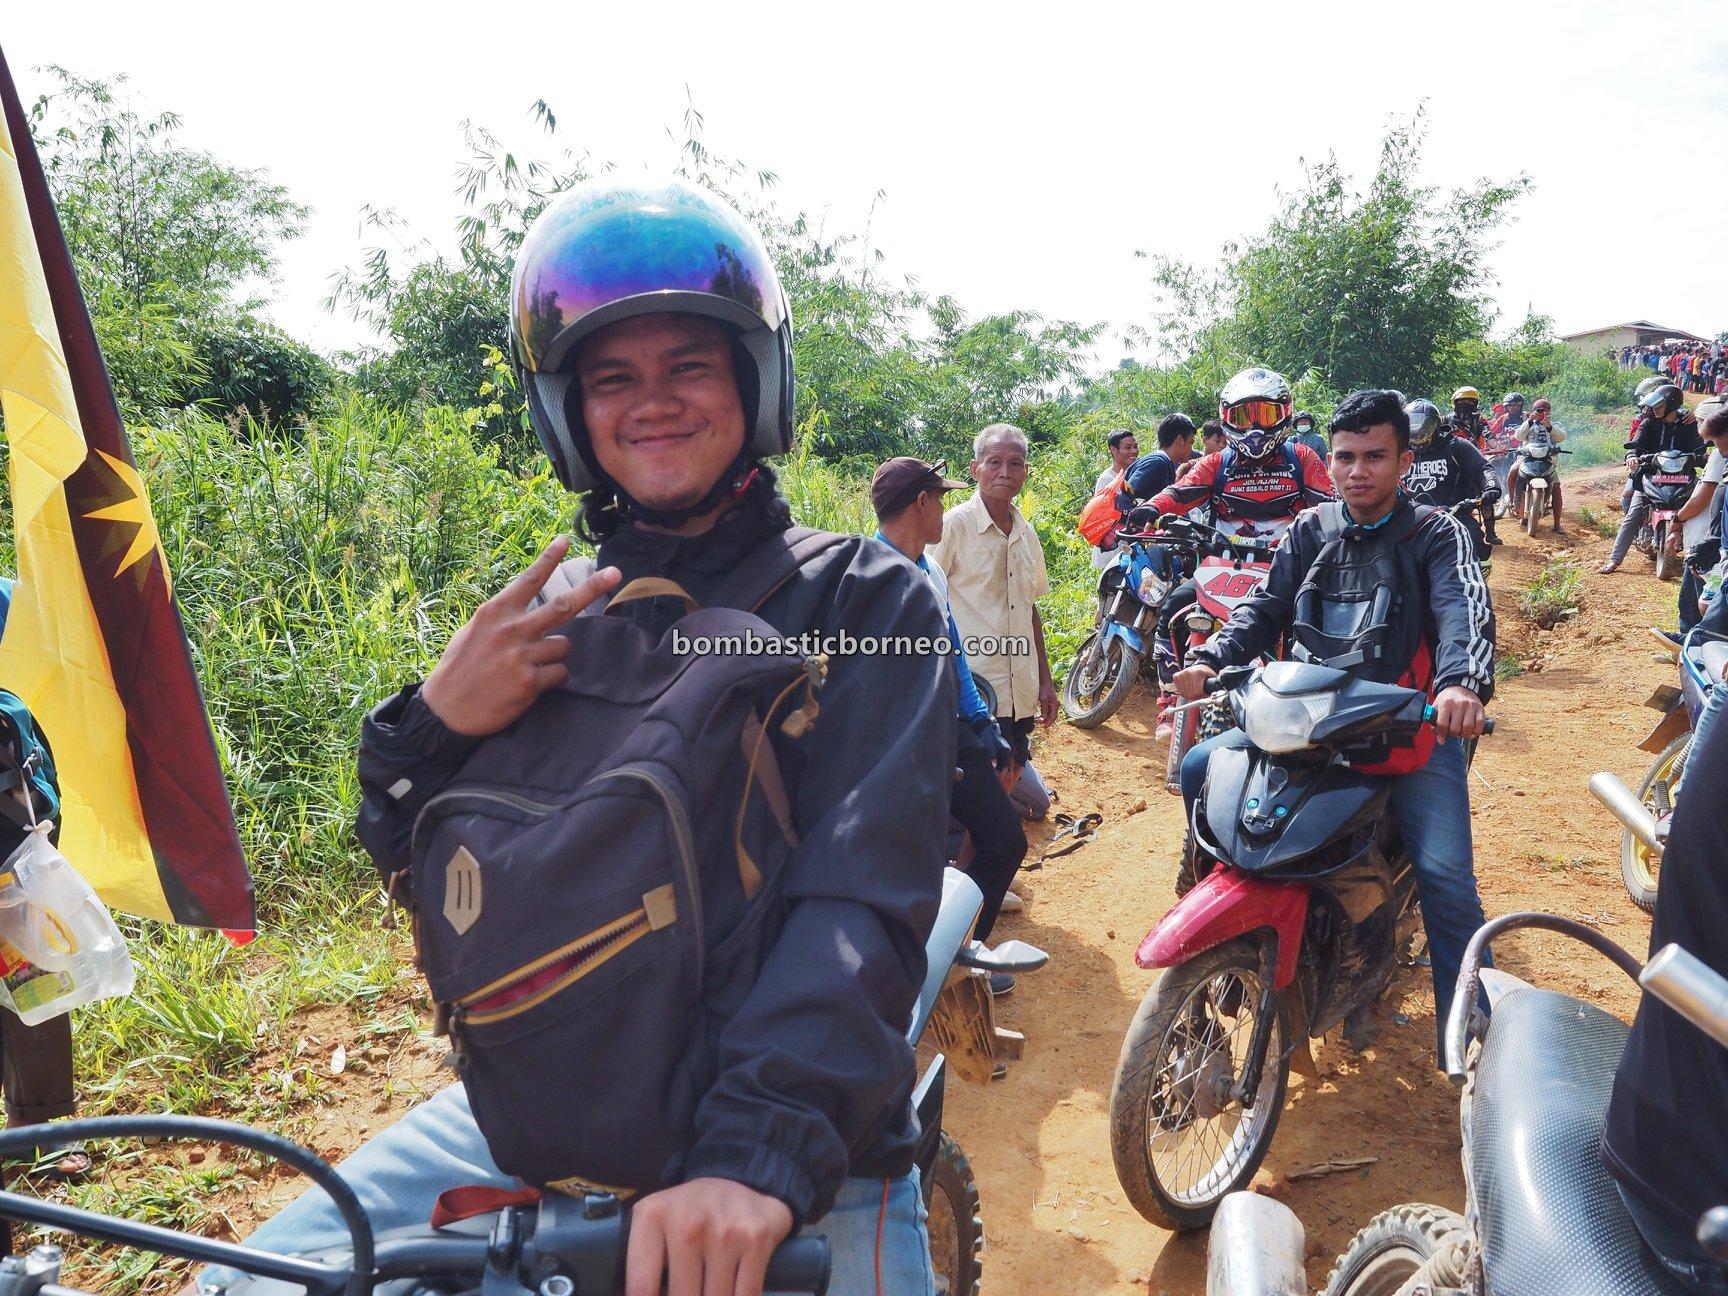 Dusun Anep, adventure, motorbike ride, traditional, Indonesia, West Kalimantan, Siding, native, village, wisata budaya, Tourism, travel guide, Borneo, 印尼西加里曼丹, 孟加映宋宫部落,